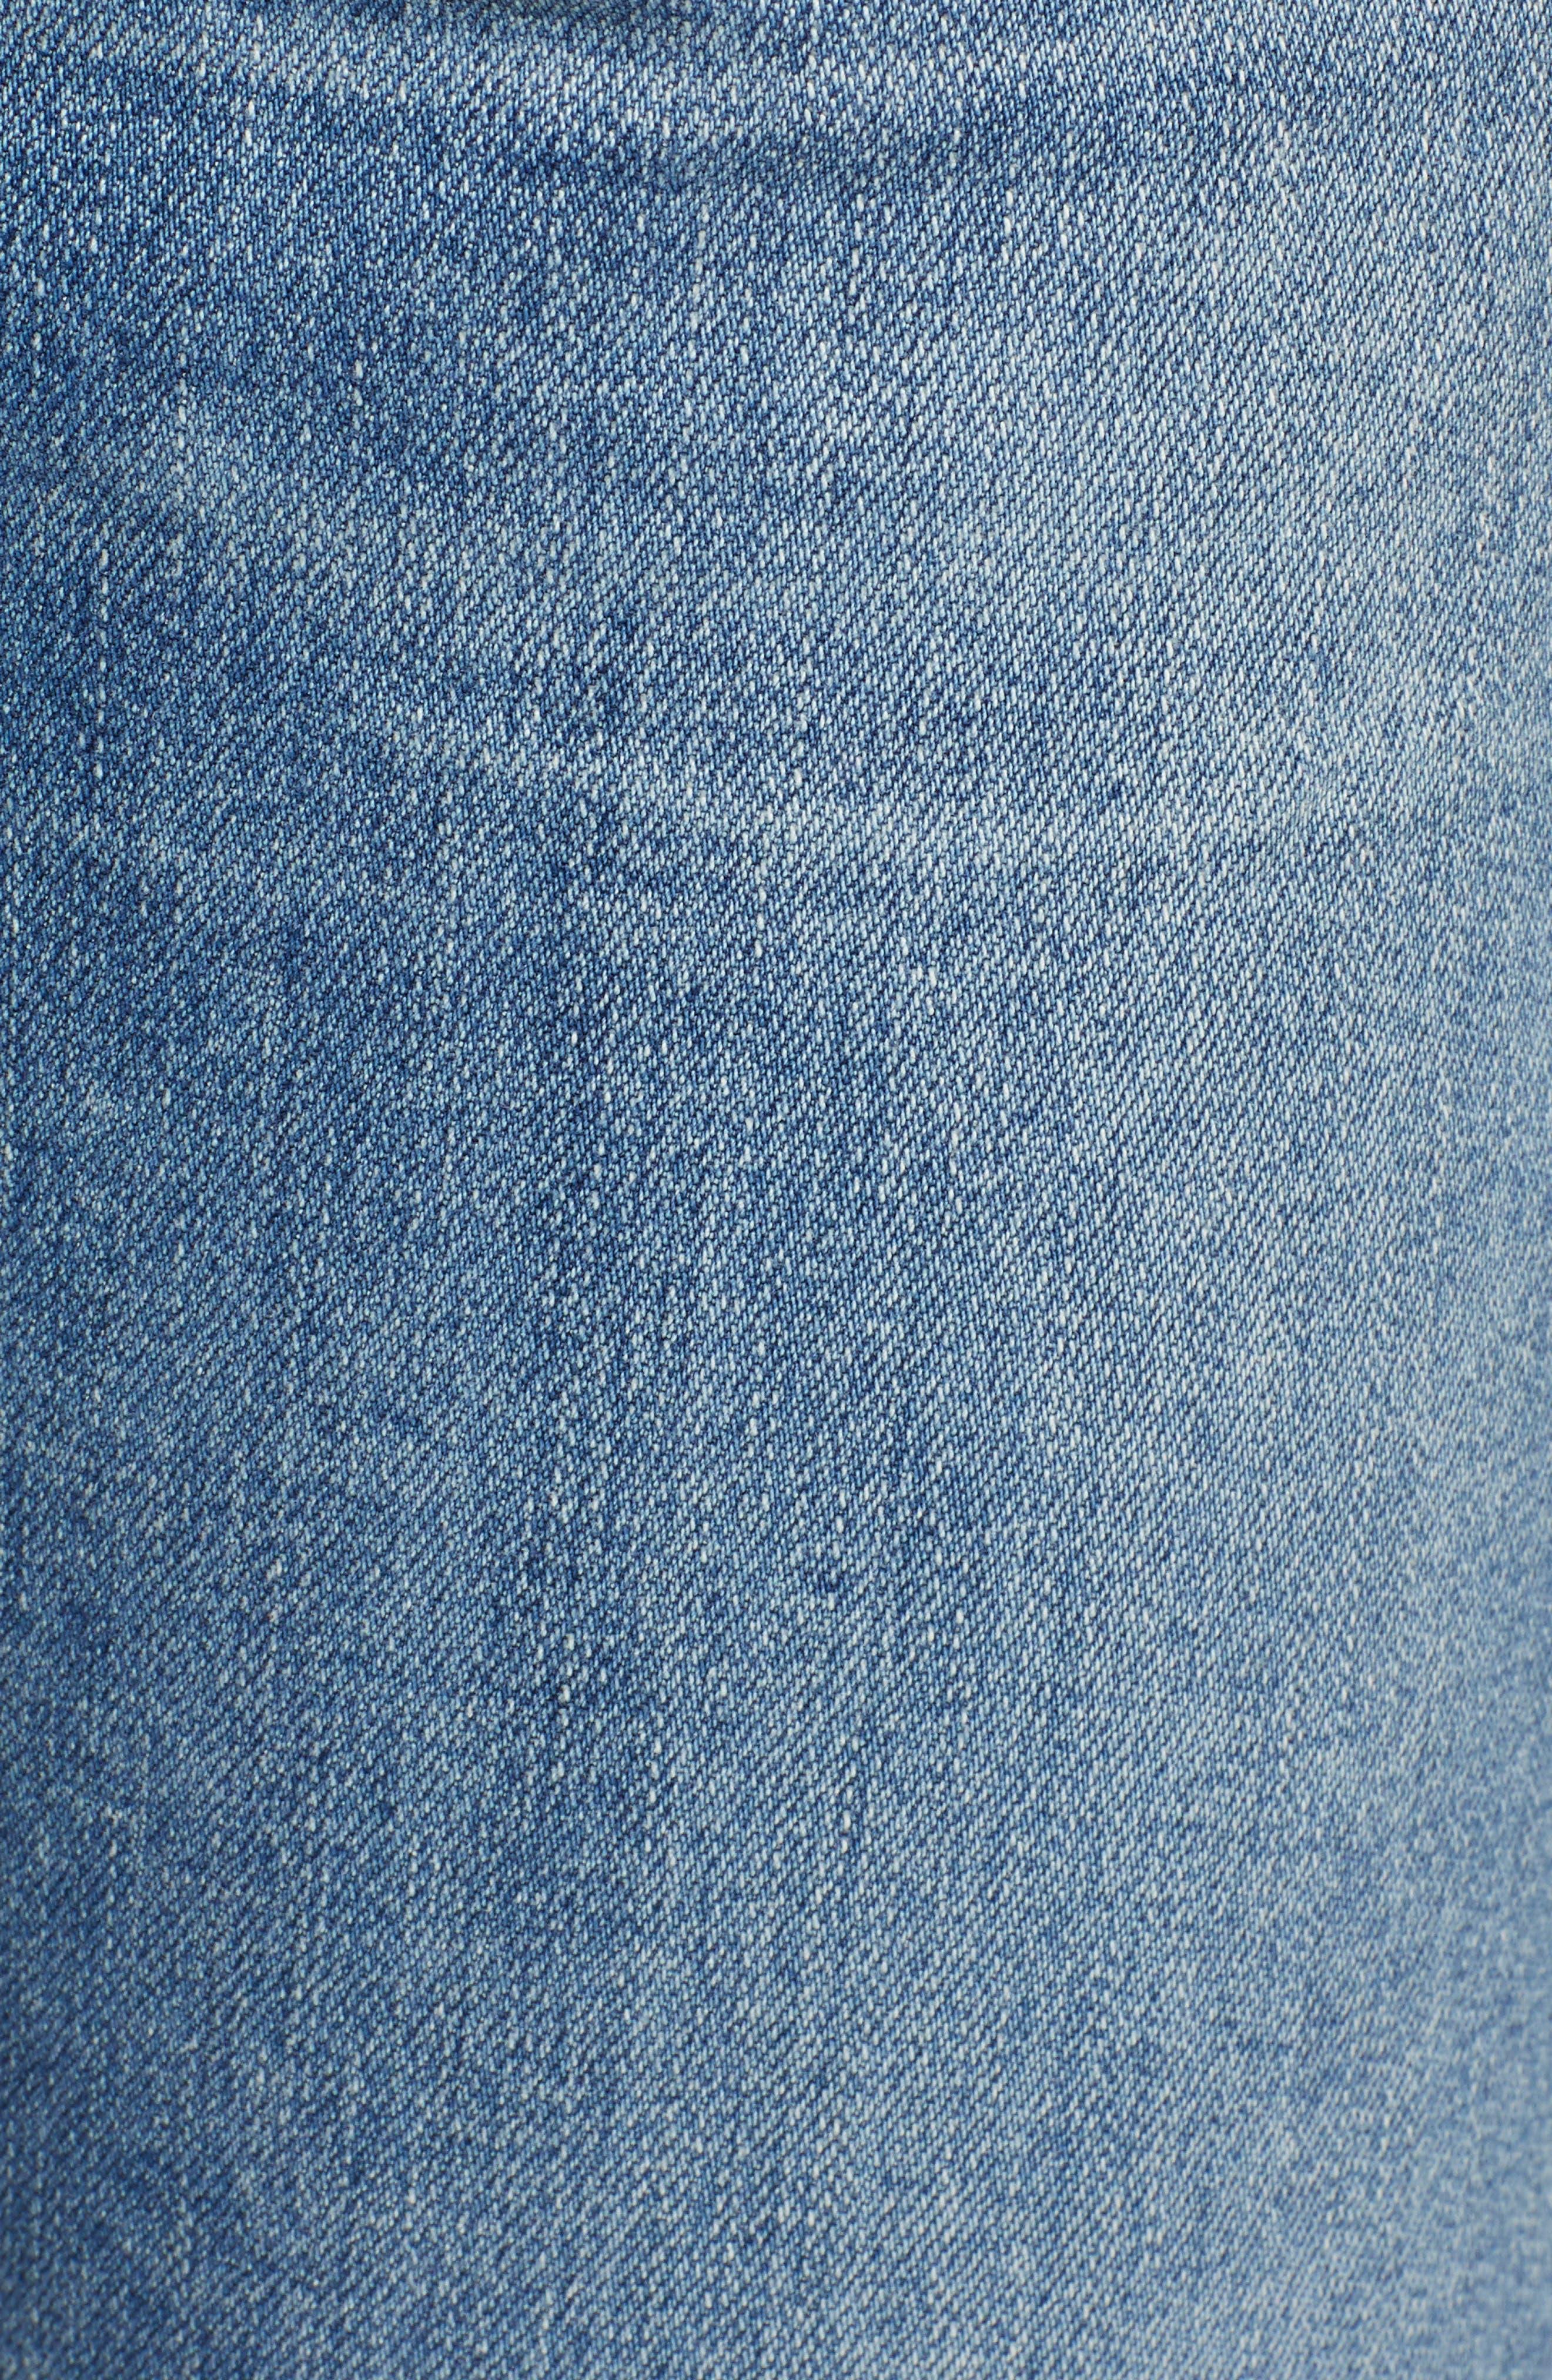 CITIZENS OF HUMANITY,                             Emerson Ankle Boyfriend Jeans,                             Alternate thumbnail 6, color,                             ENCORE